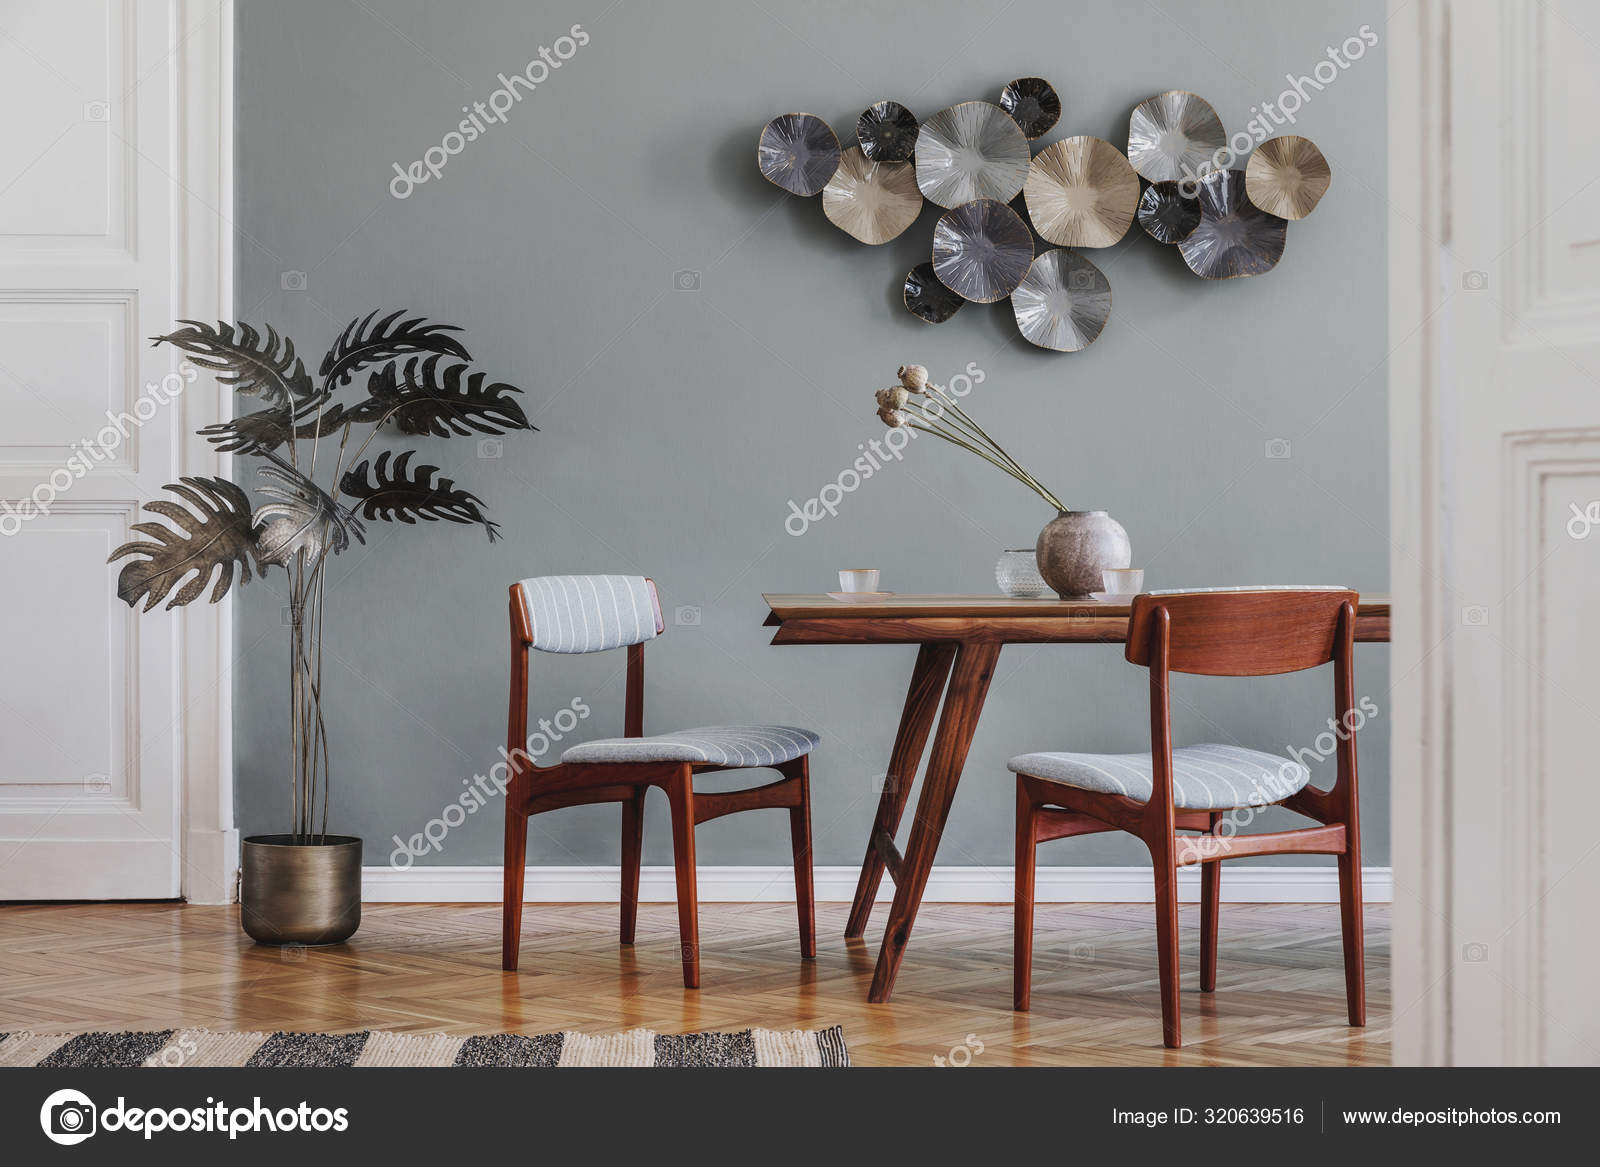 Modern Stylish Dining Room Interior, Stylish Dining Room Chairs